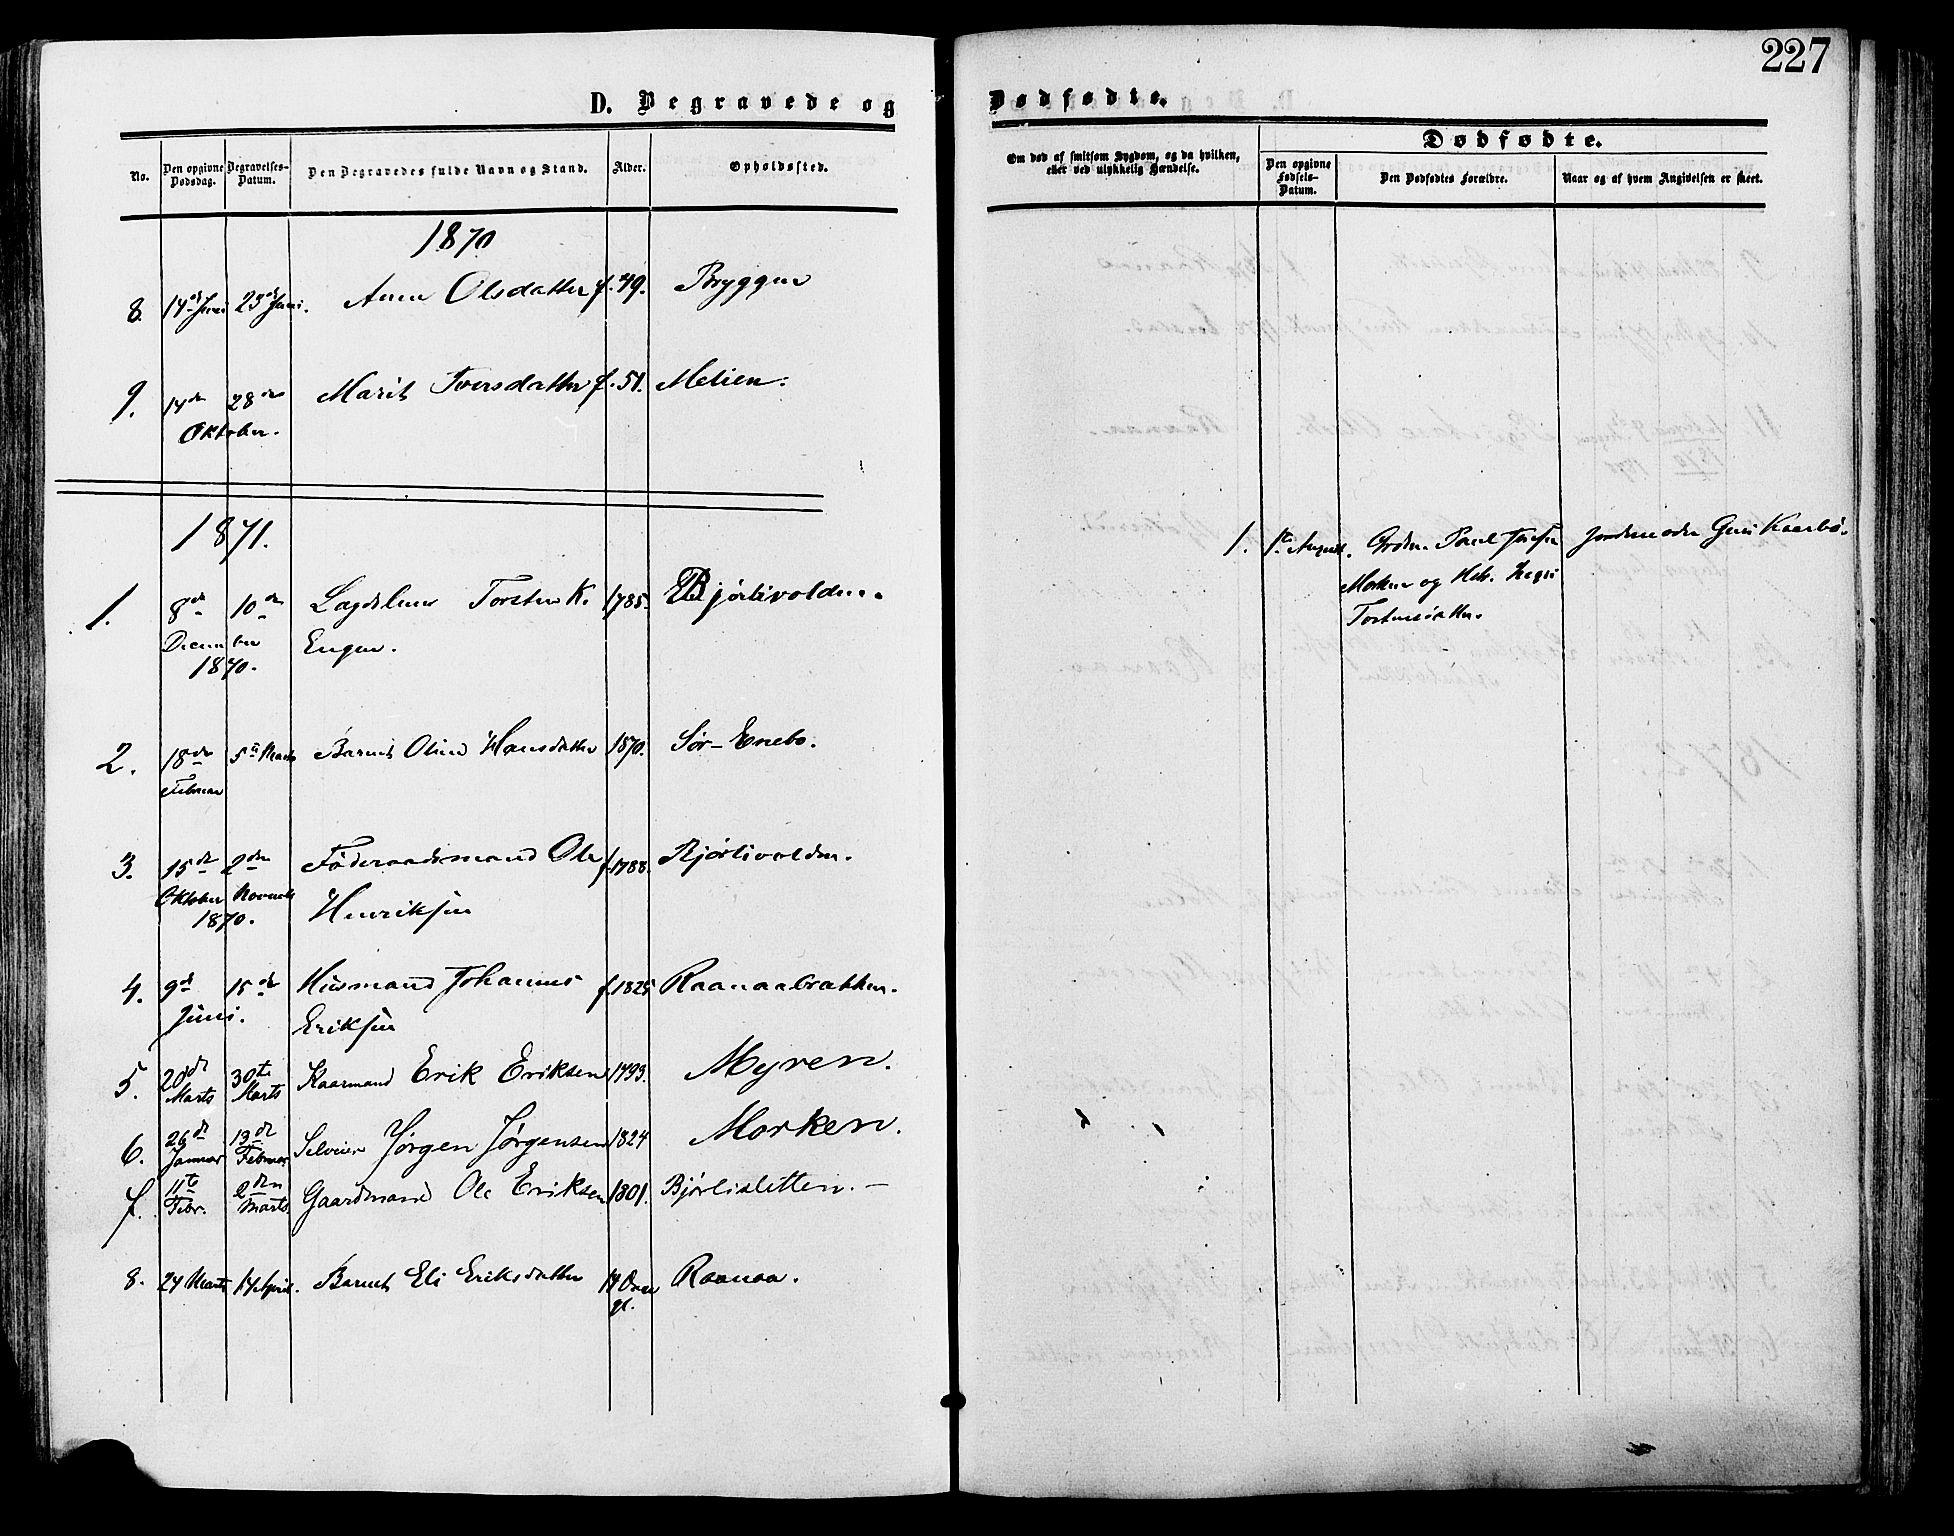 SAH, Lesja prestekontor, Ministerialbok nr. 9, 1854-1889, s. 227